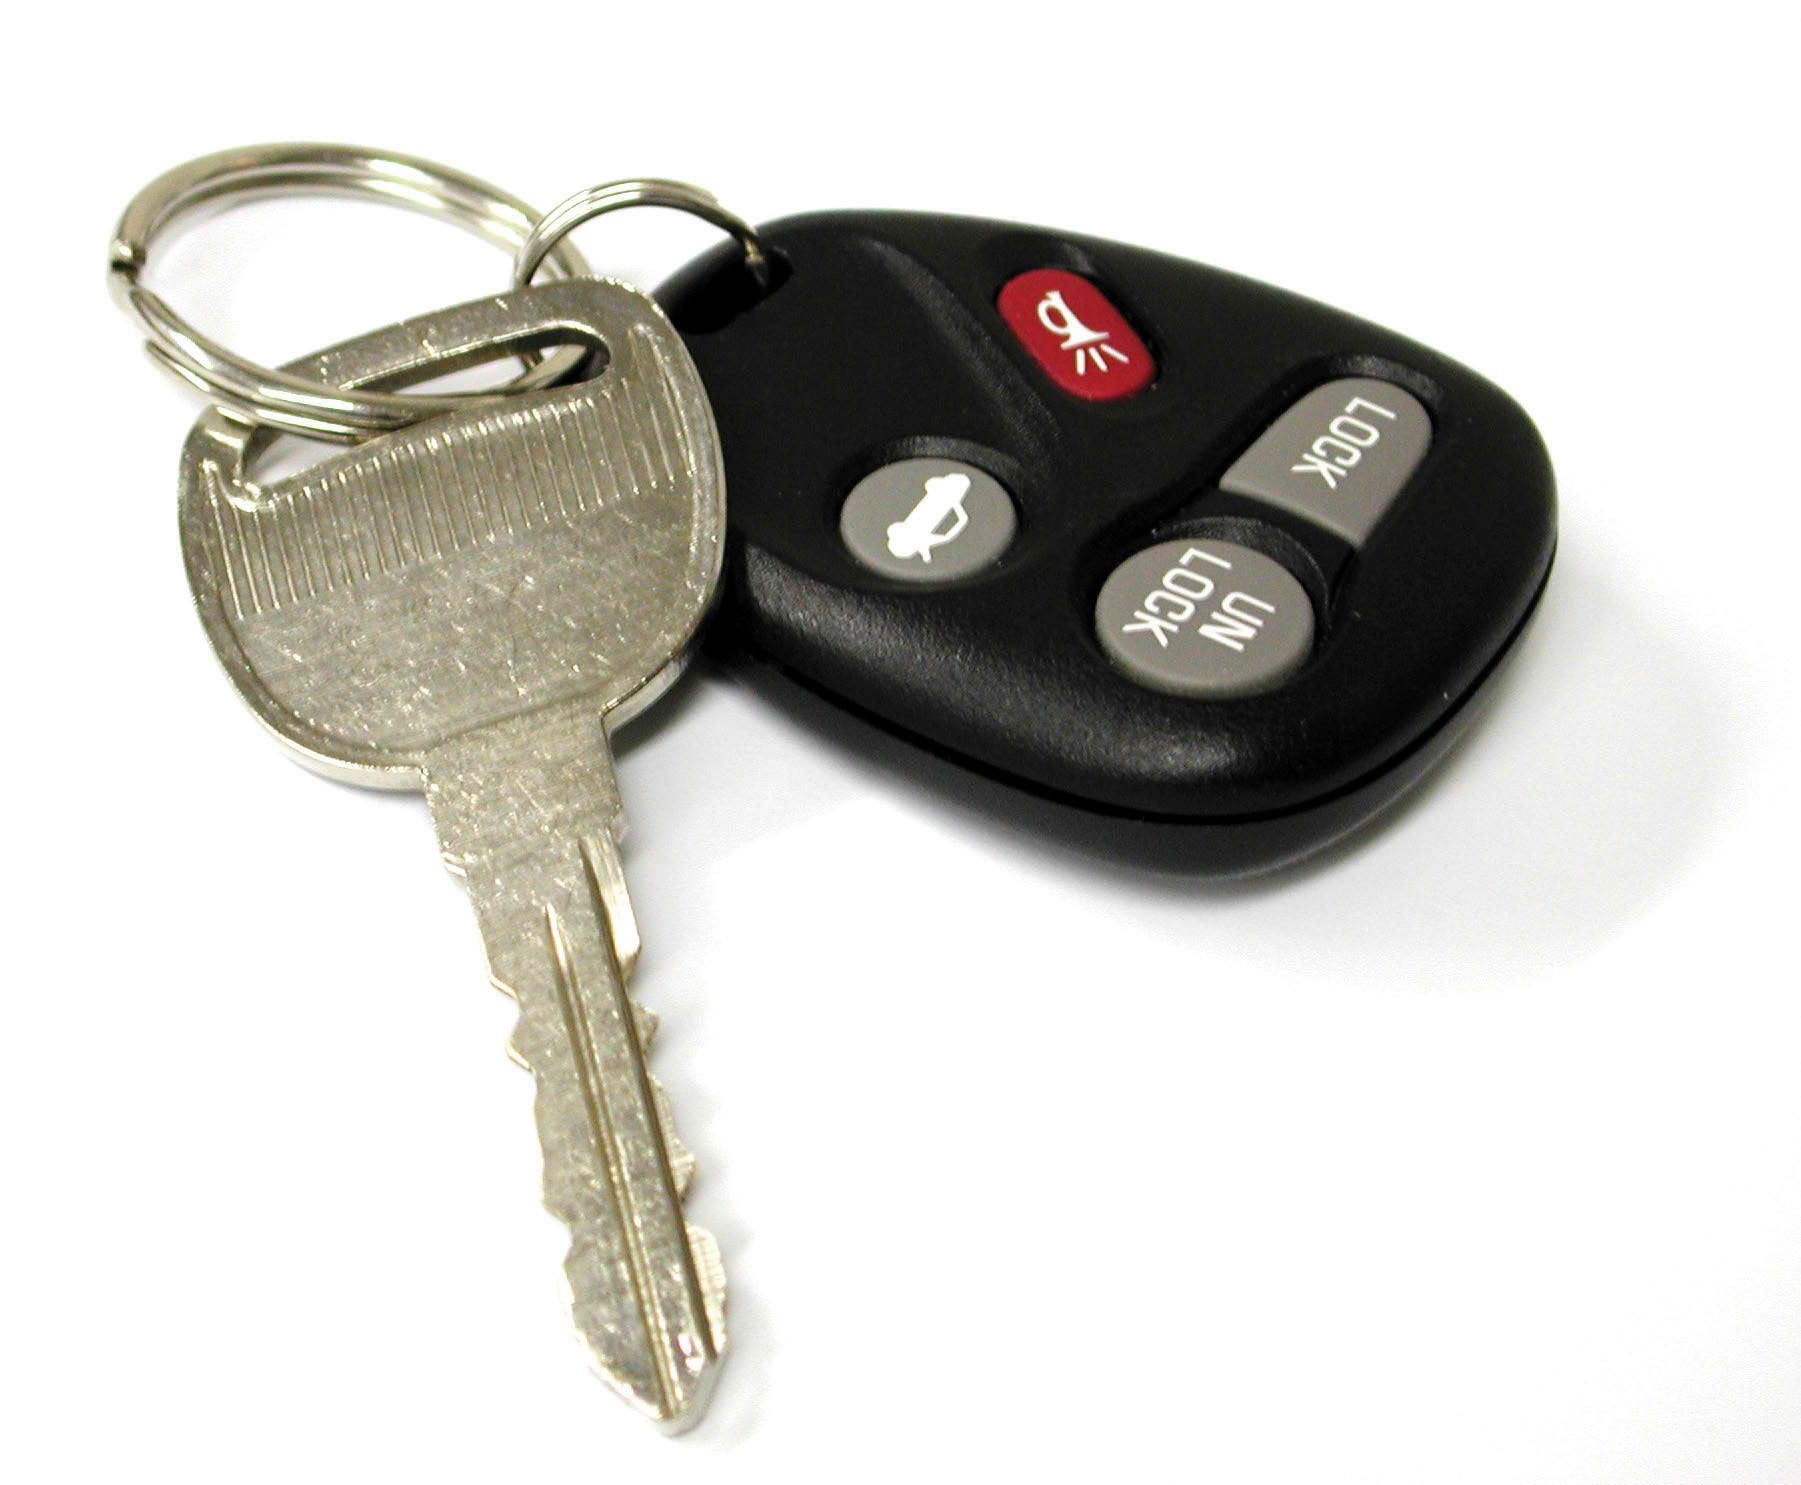 automatic key car. Home safety, Car keys, Make keys